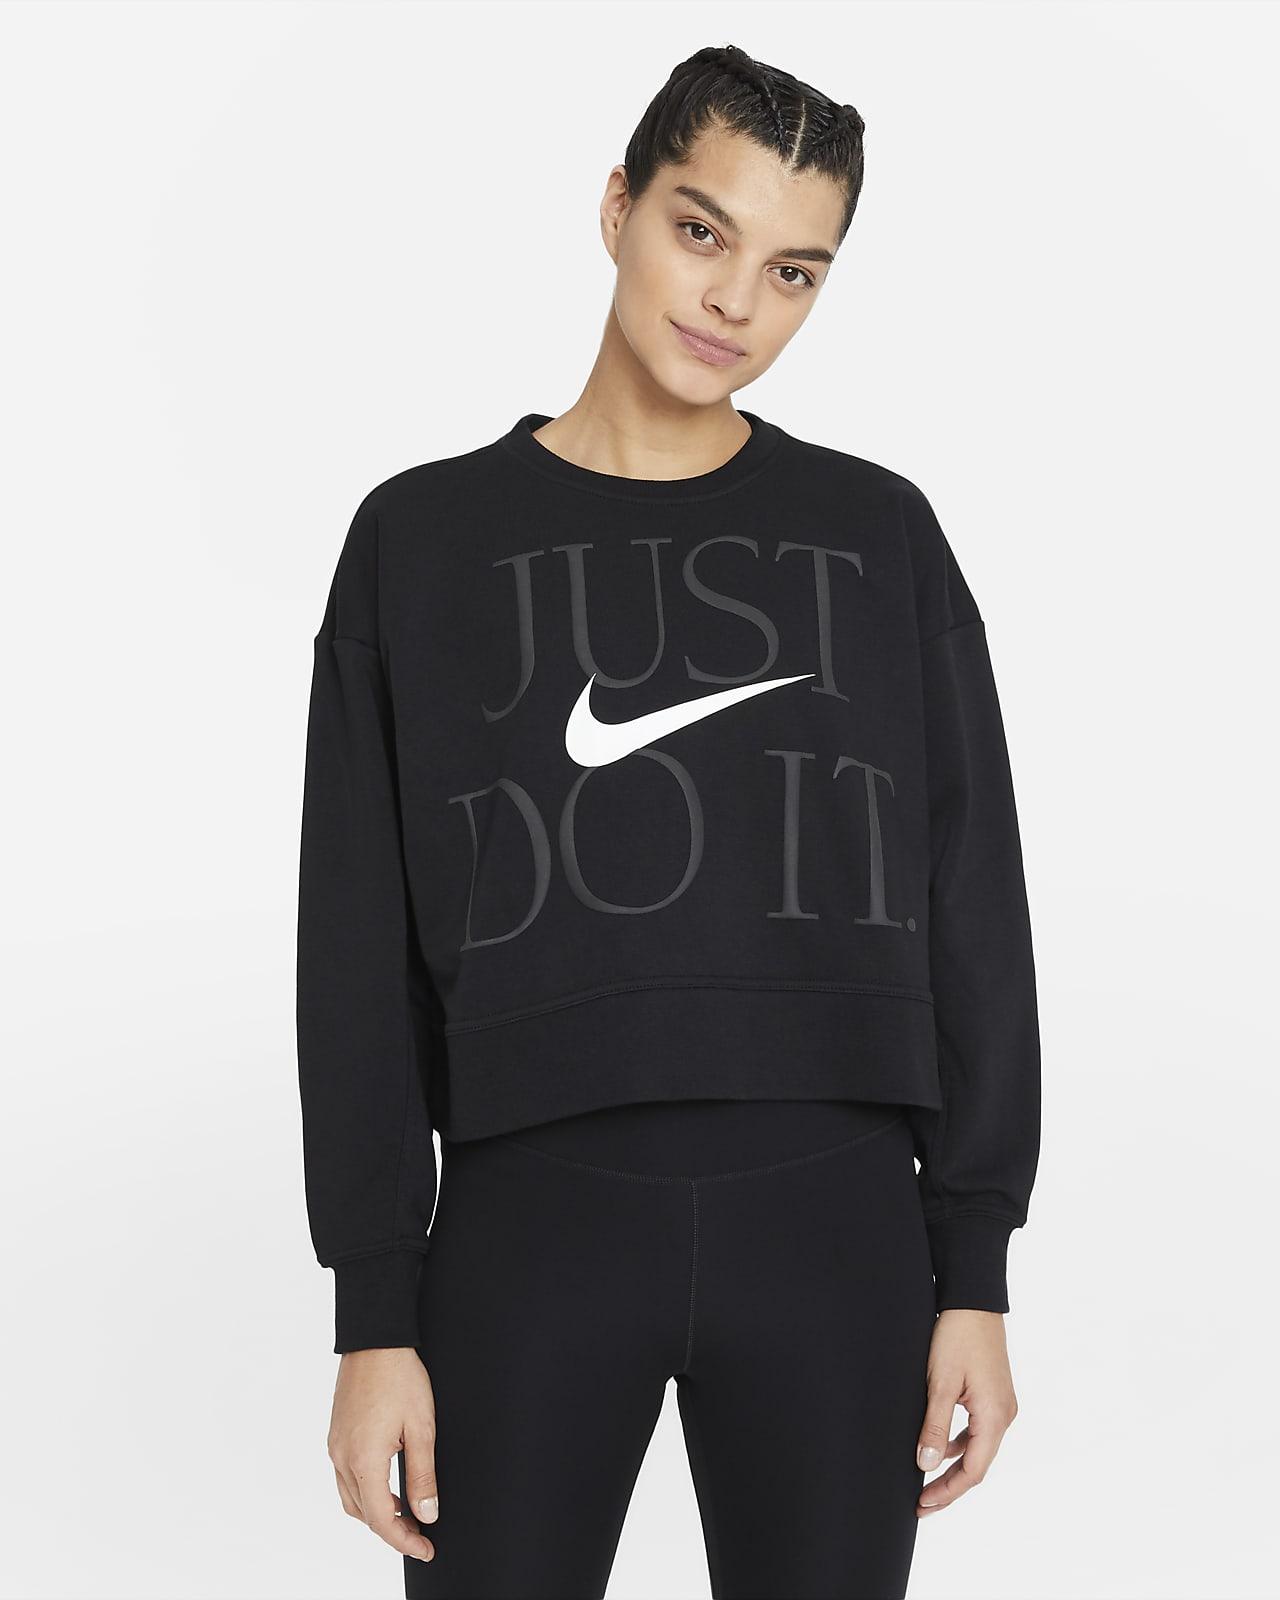 Nike Dri-FIT Get Fit Trainingsshirt met ronde hals voor dames